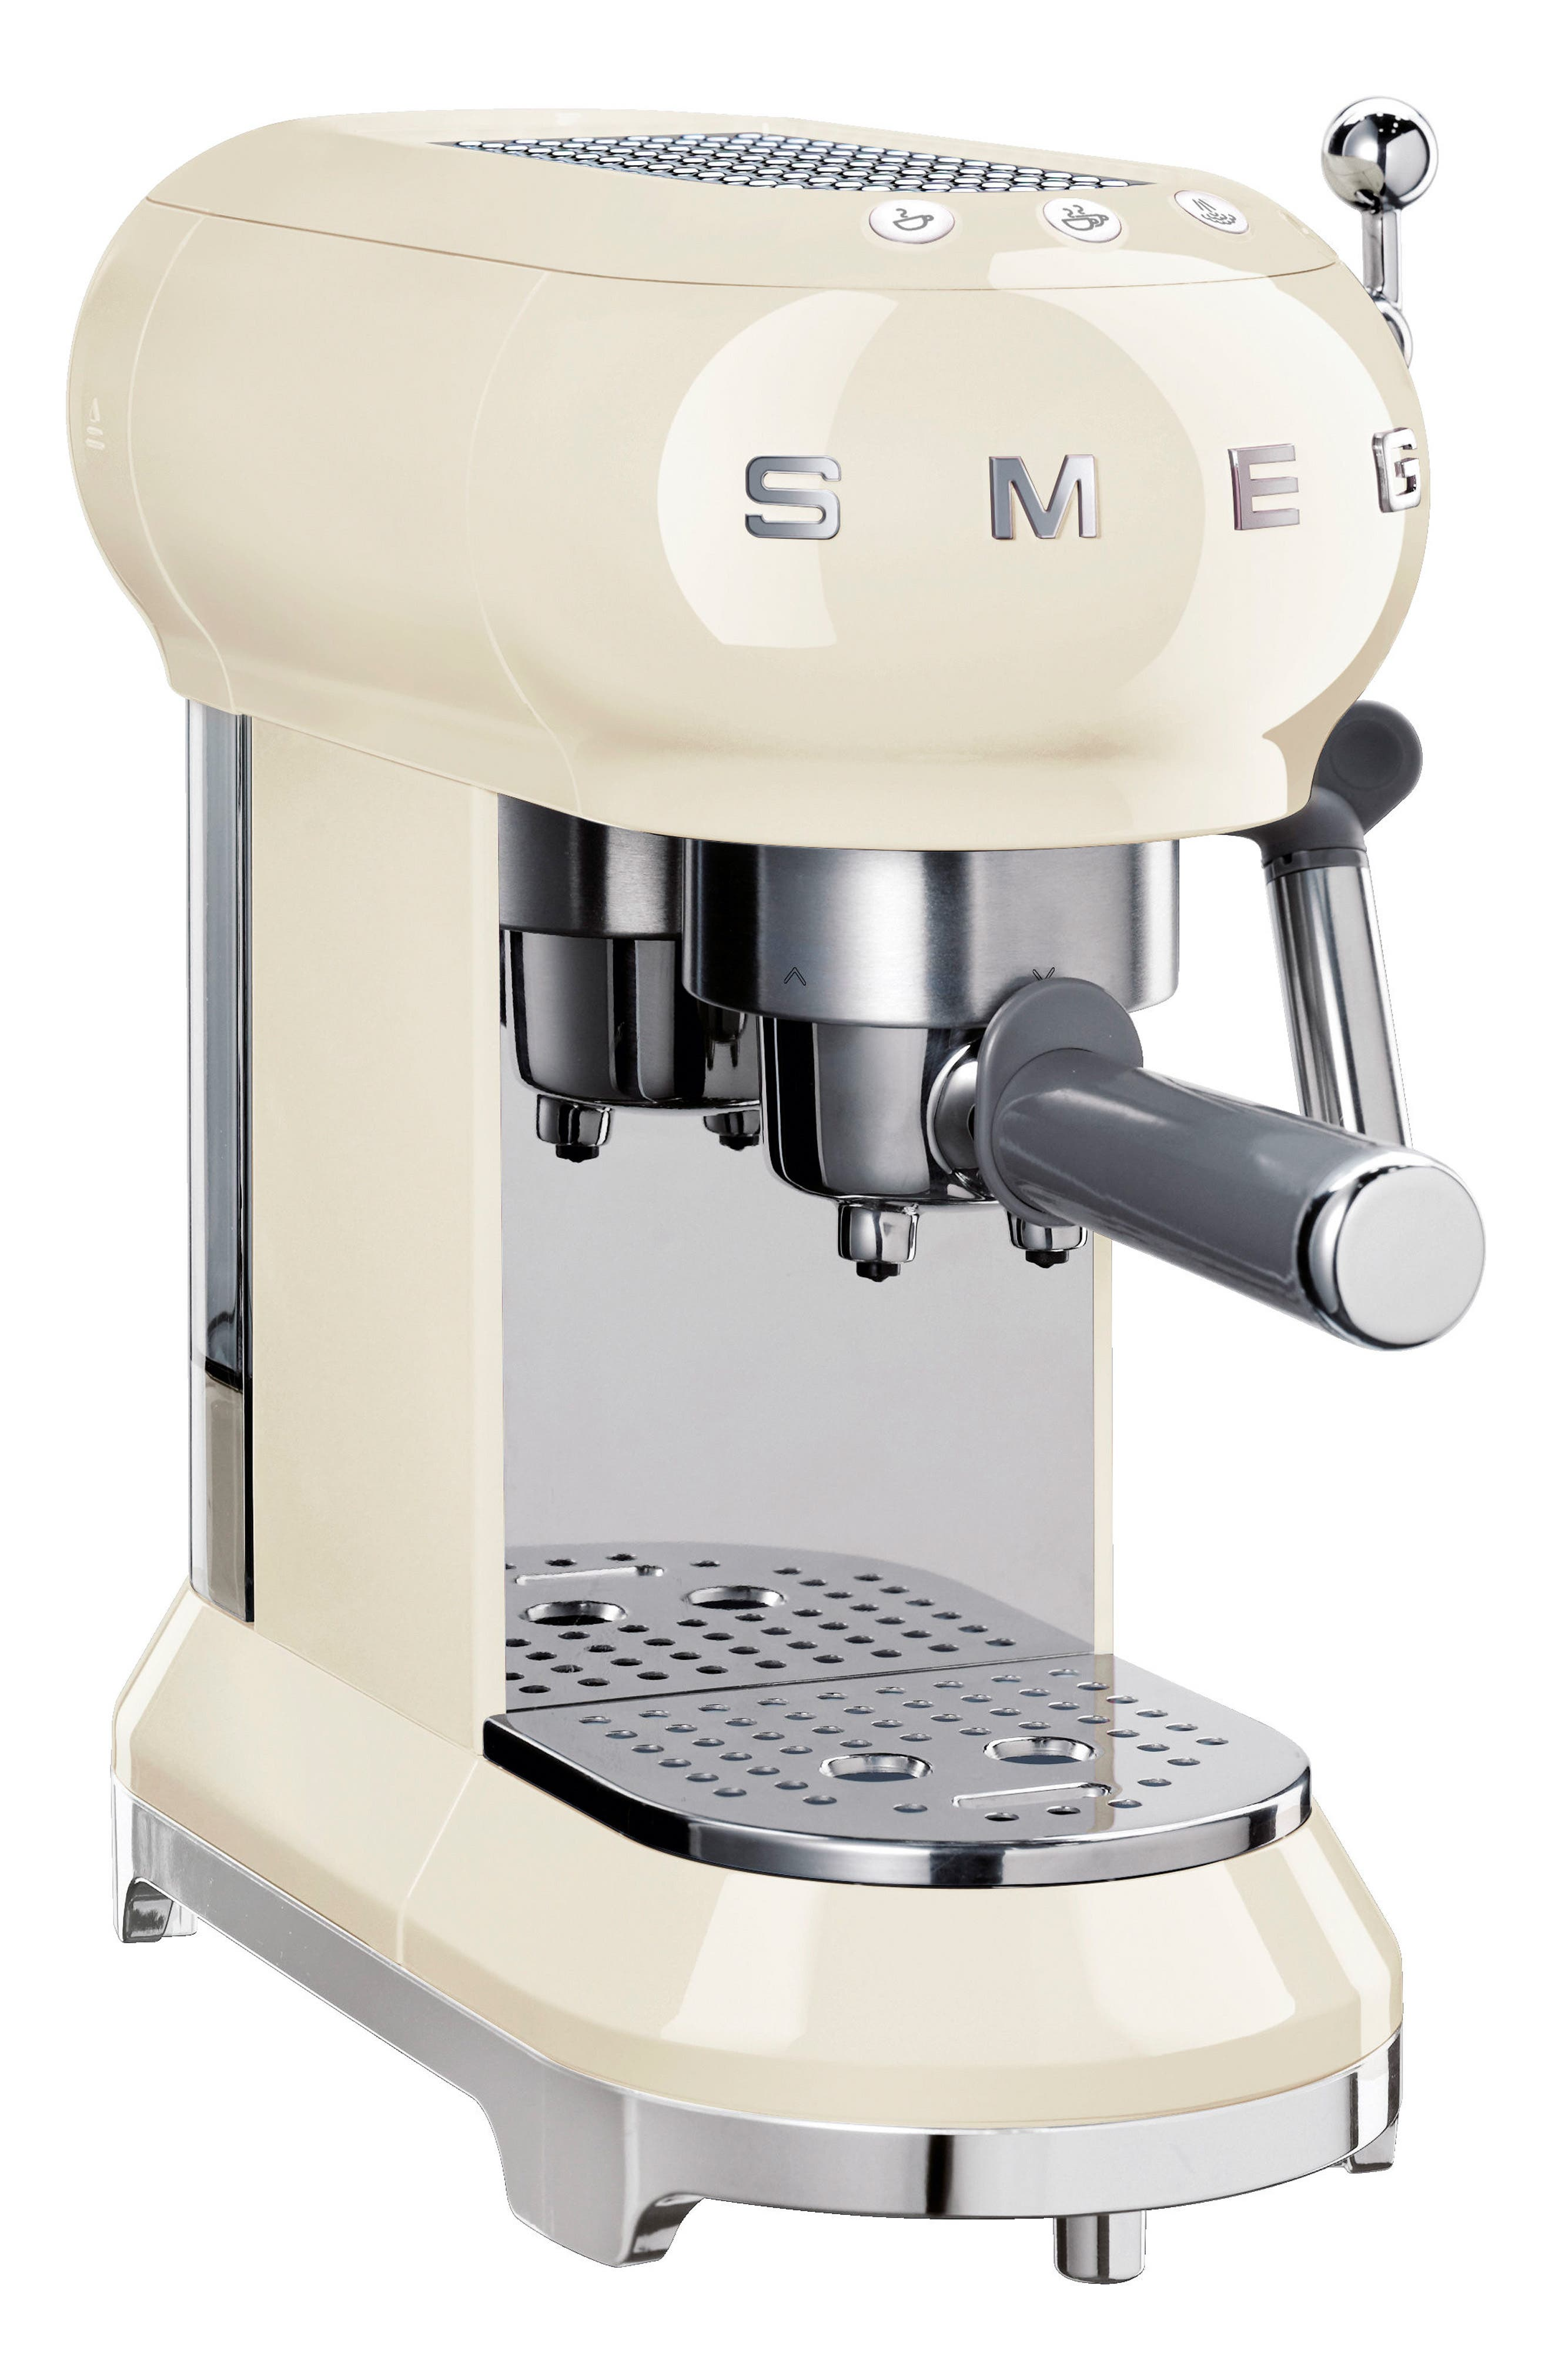 smeg 50s Retro Style Espresso Coffee Machine